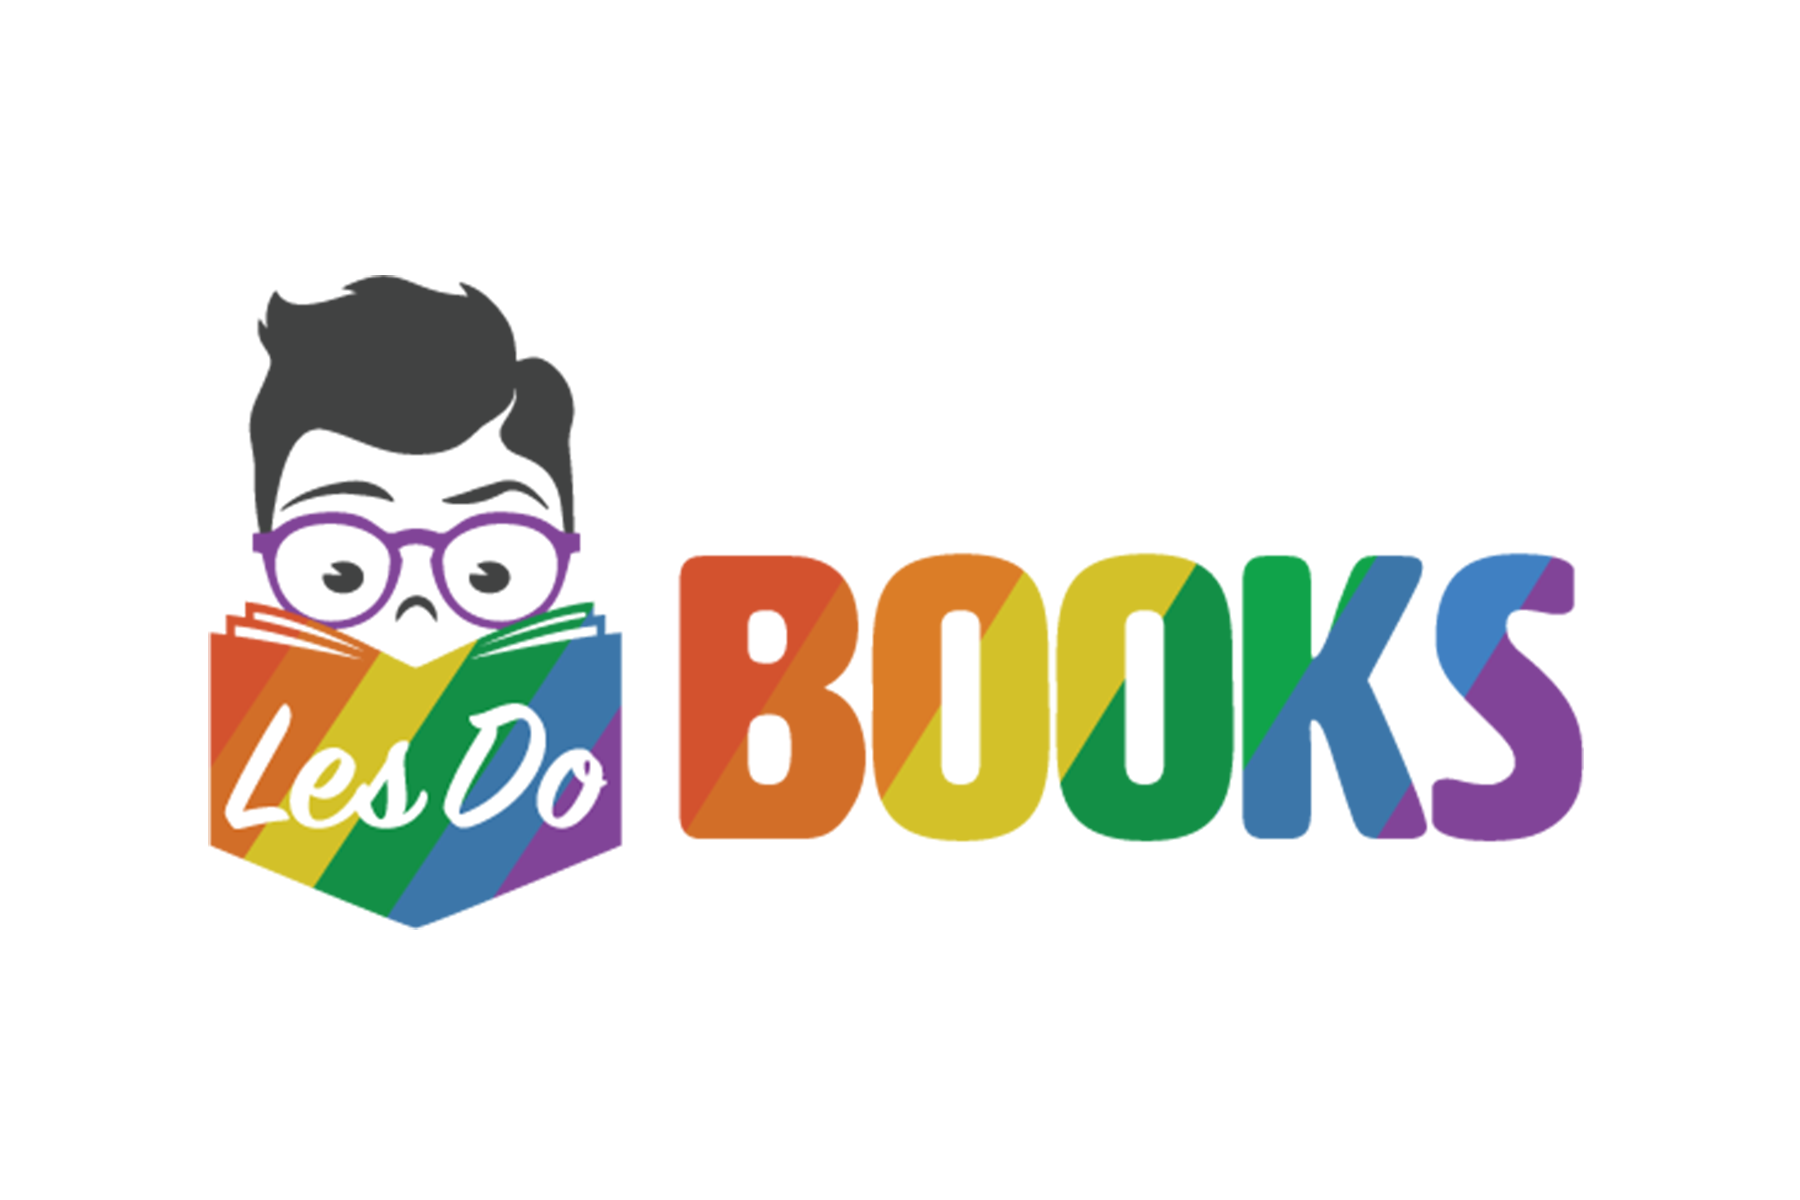 LesDo Books - For Tara Scott's Les Do Books on The Lesbian Talk Show